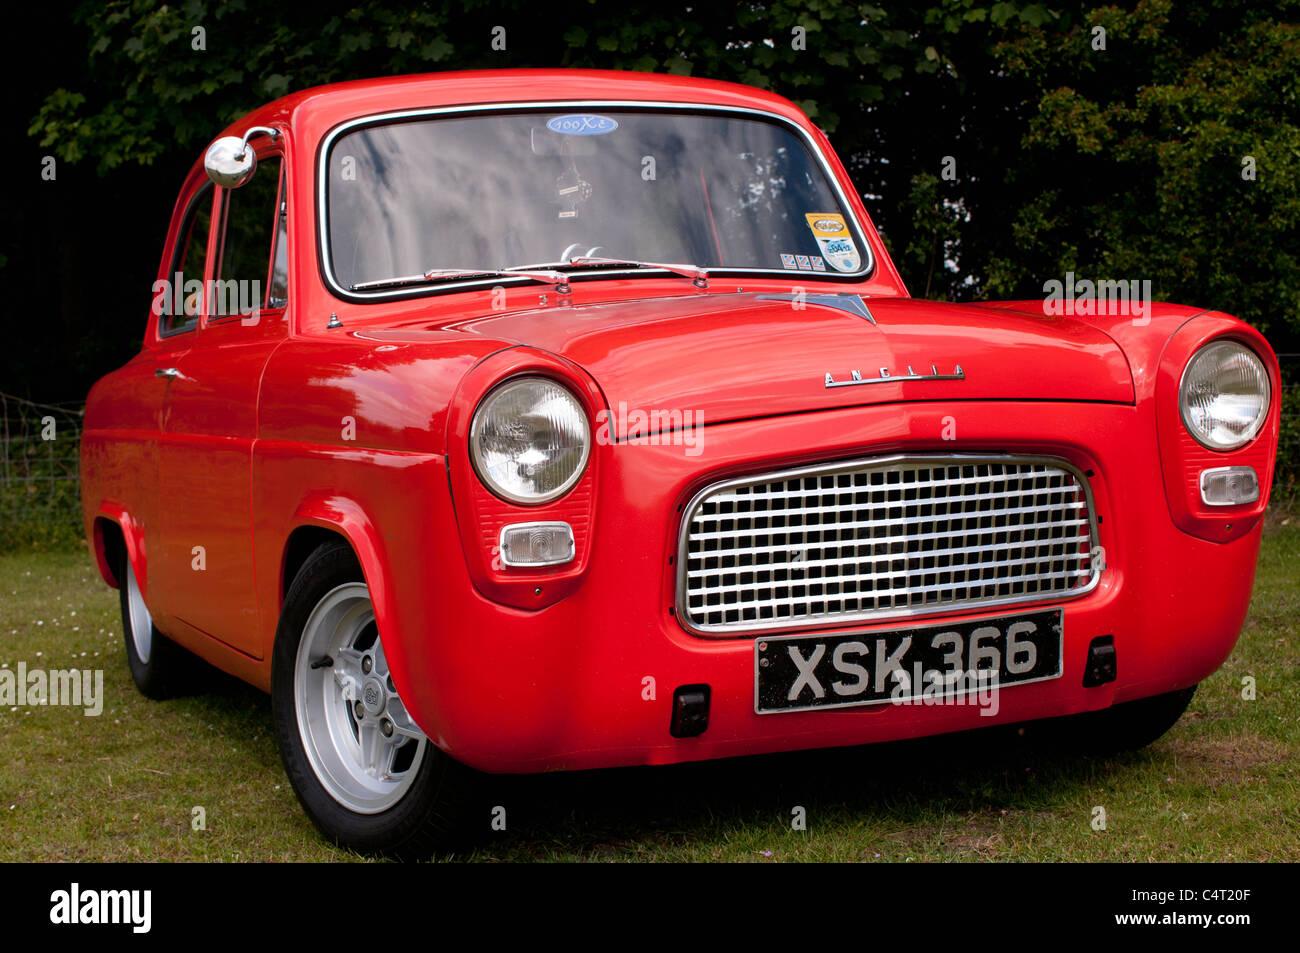 Renovierte Oldtimer 1959 Ford Anglia 100E Stockbild